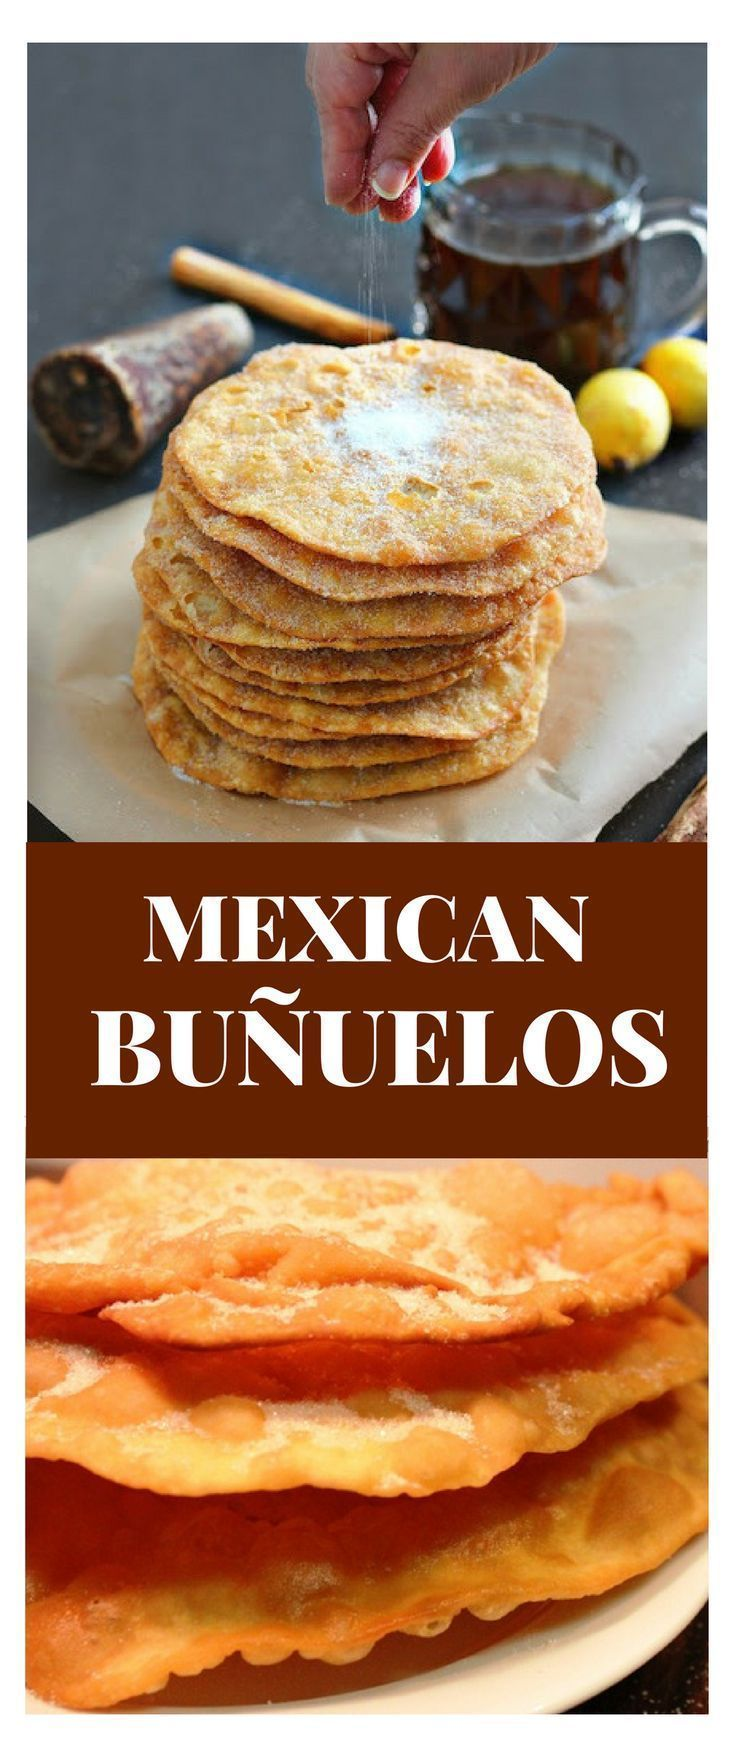 How to make bunuelos